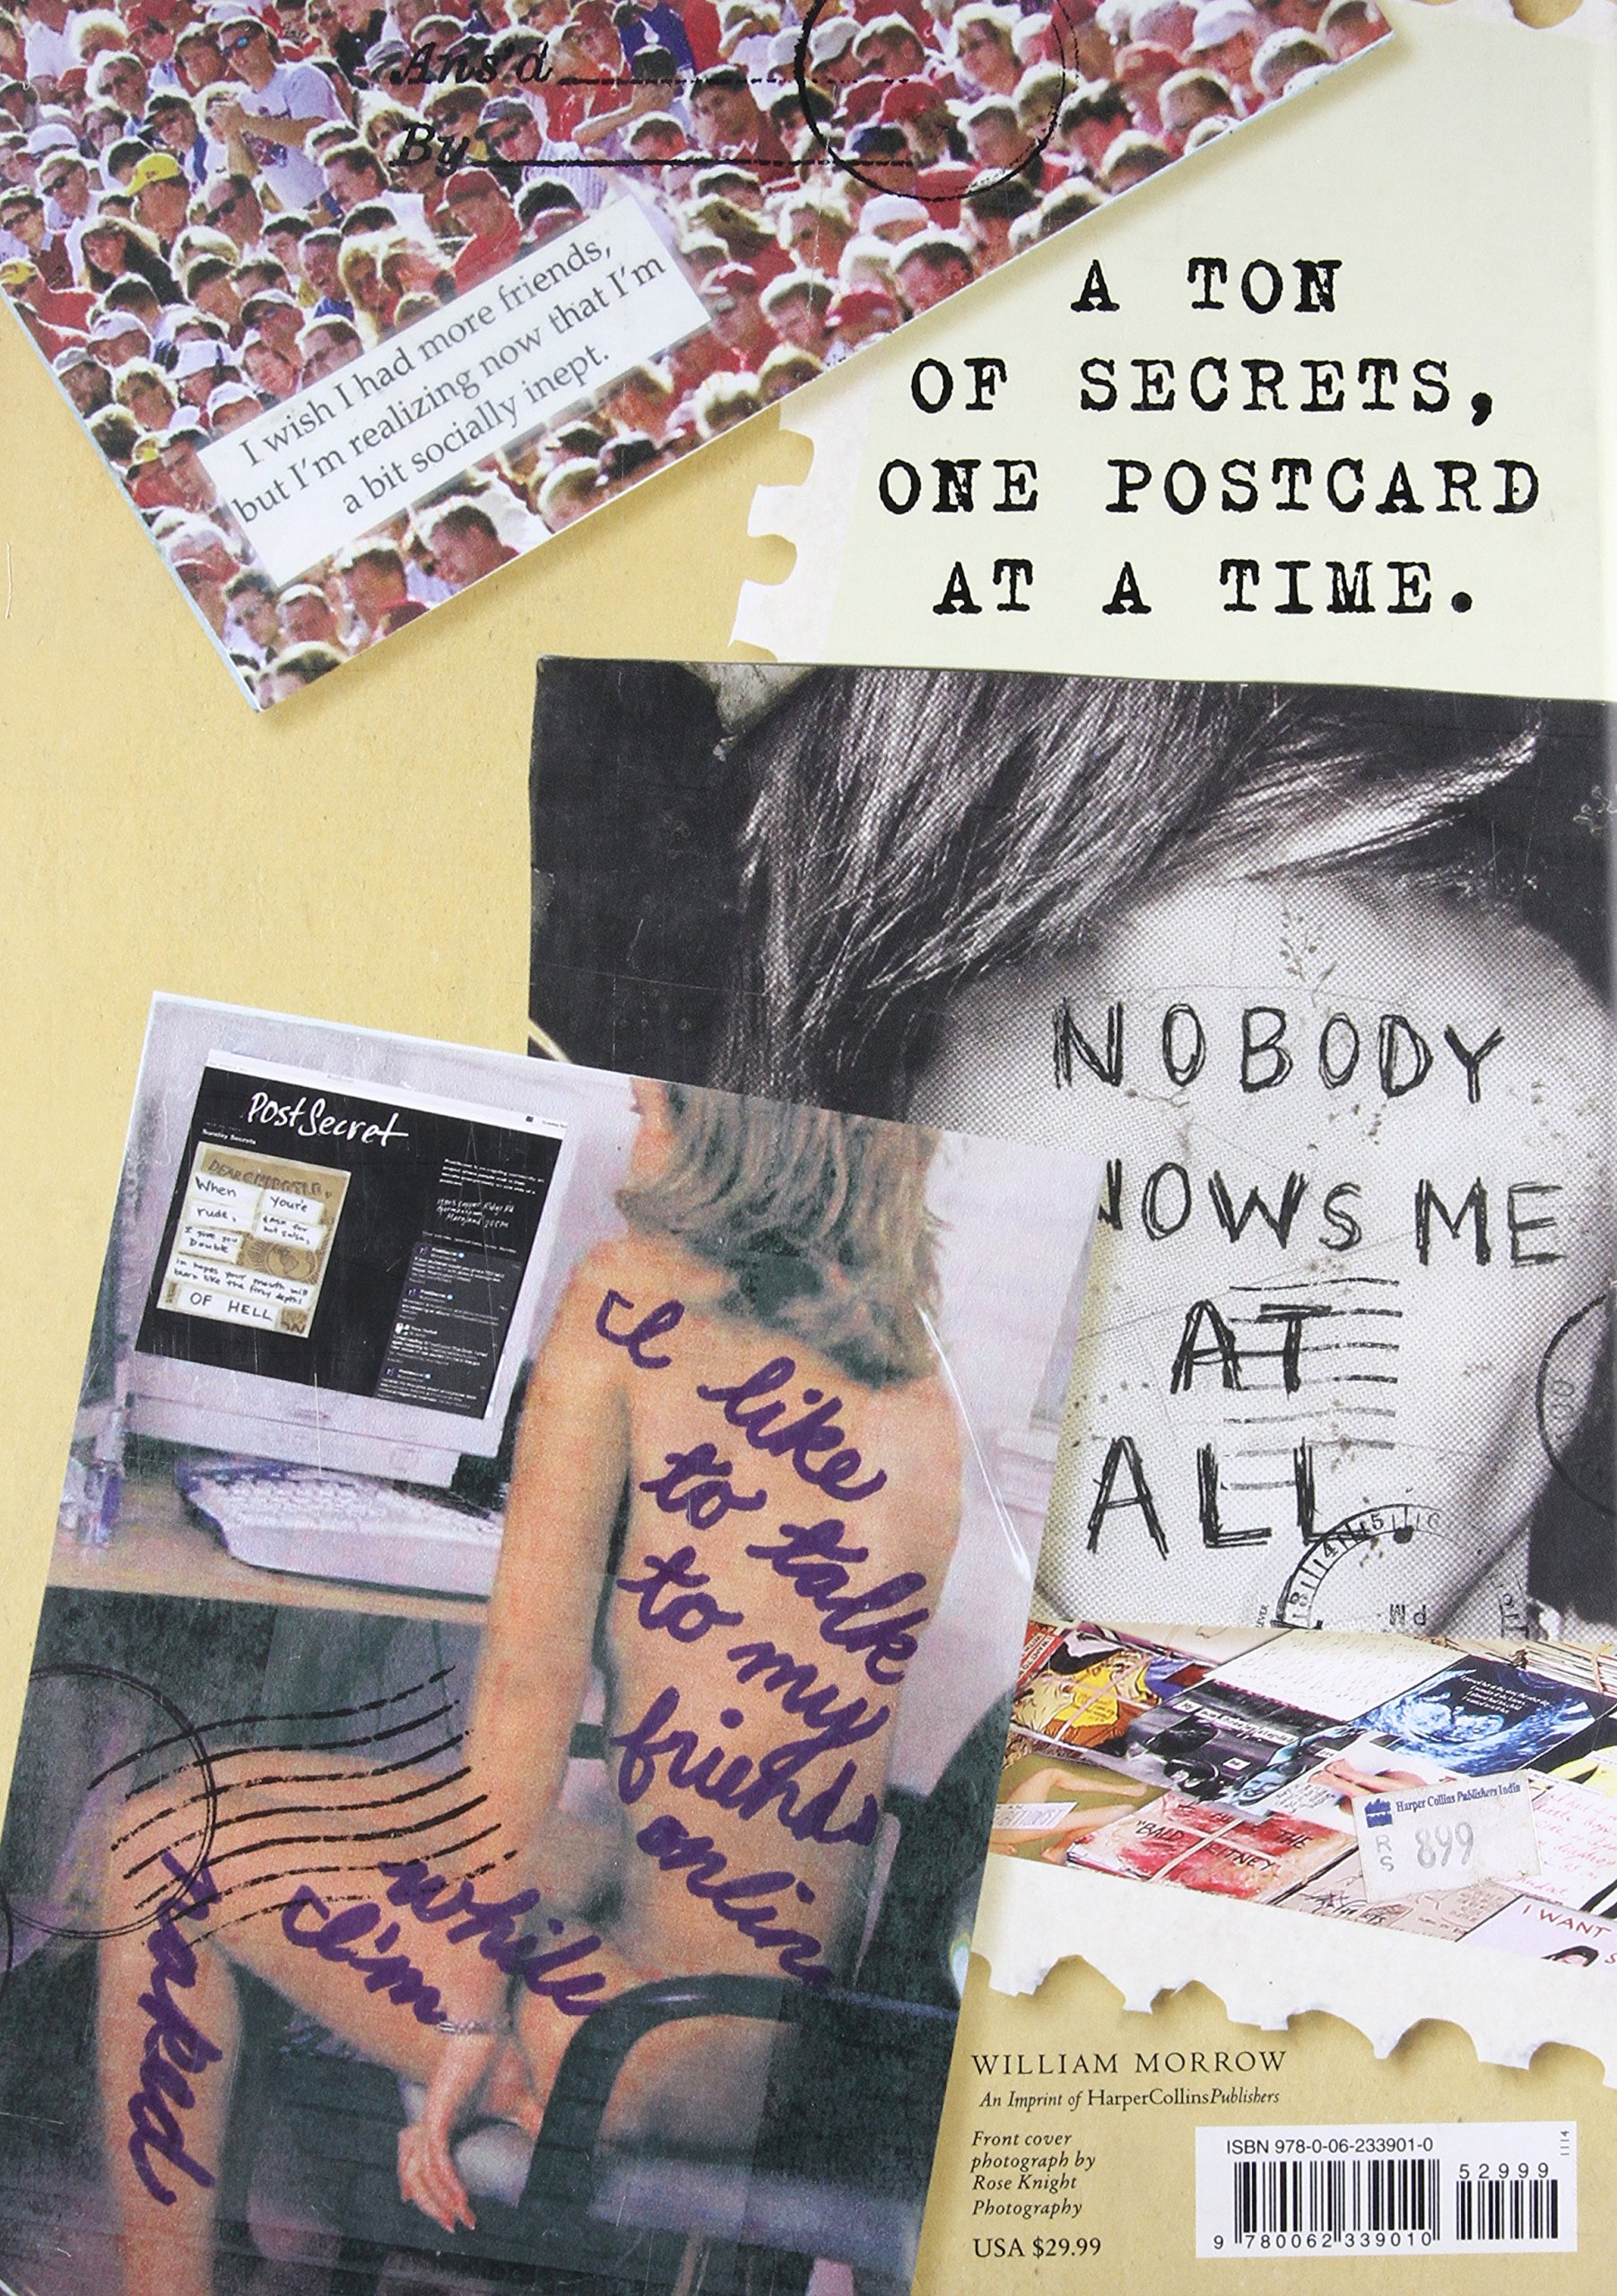 amazon com the world of postsecret 9780062339010 frank warren books